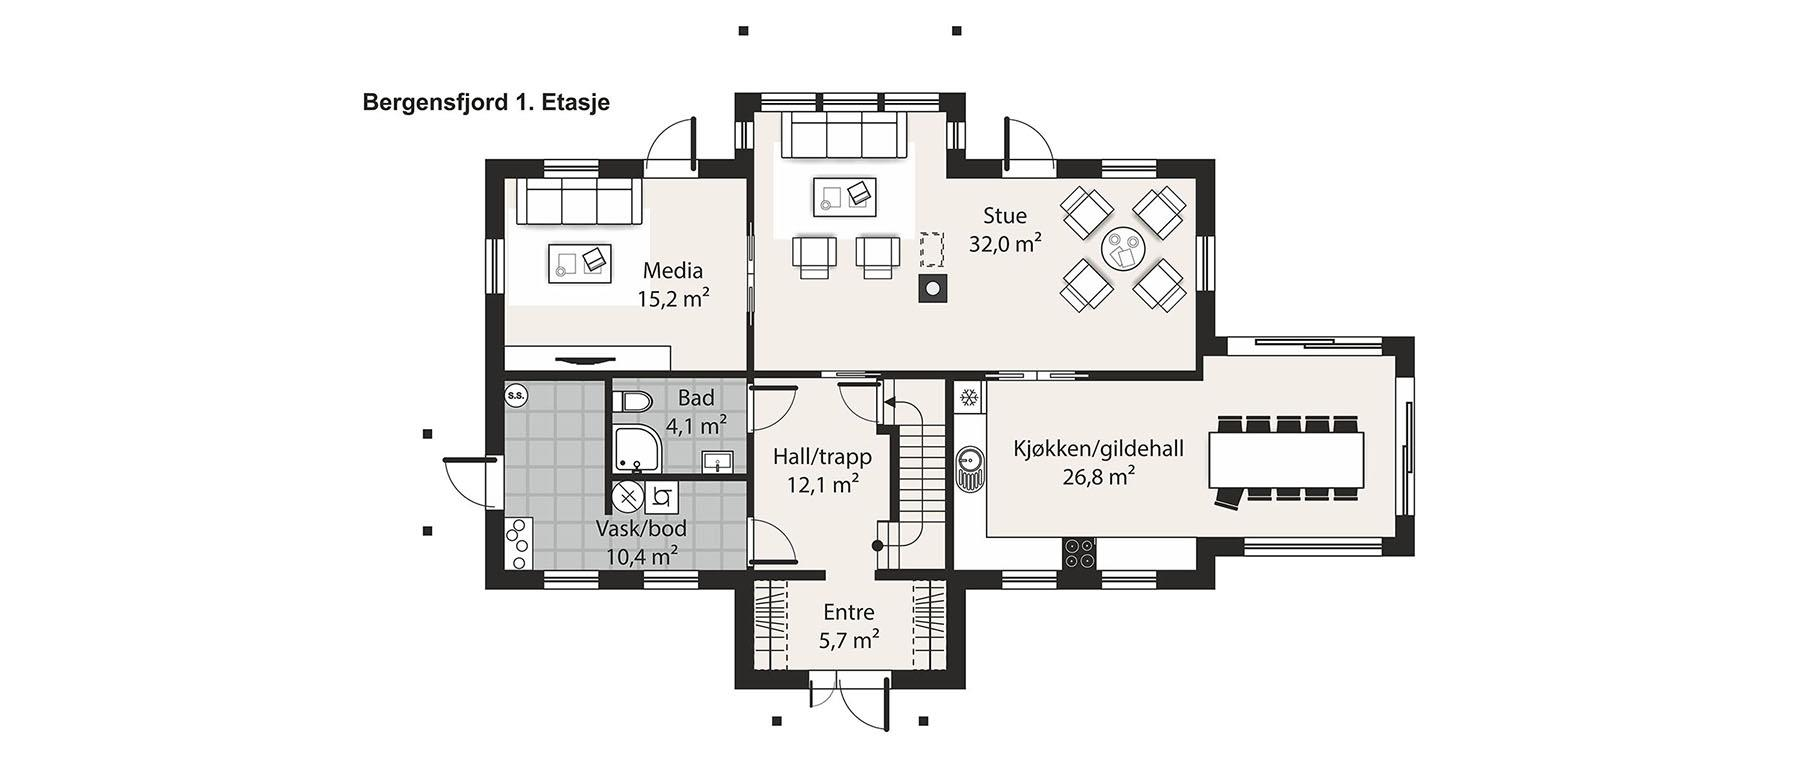 Hus 1 Norge Herregårds - serien Bergensfjord etasje 1